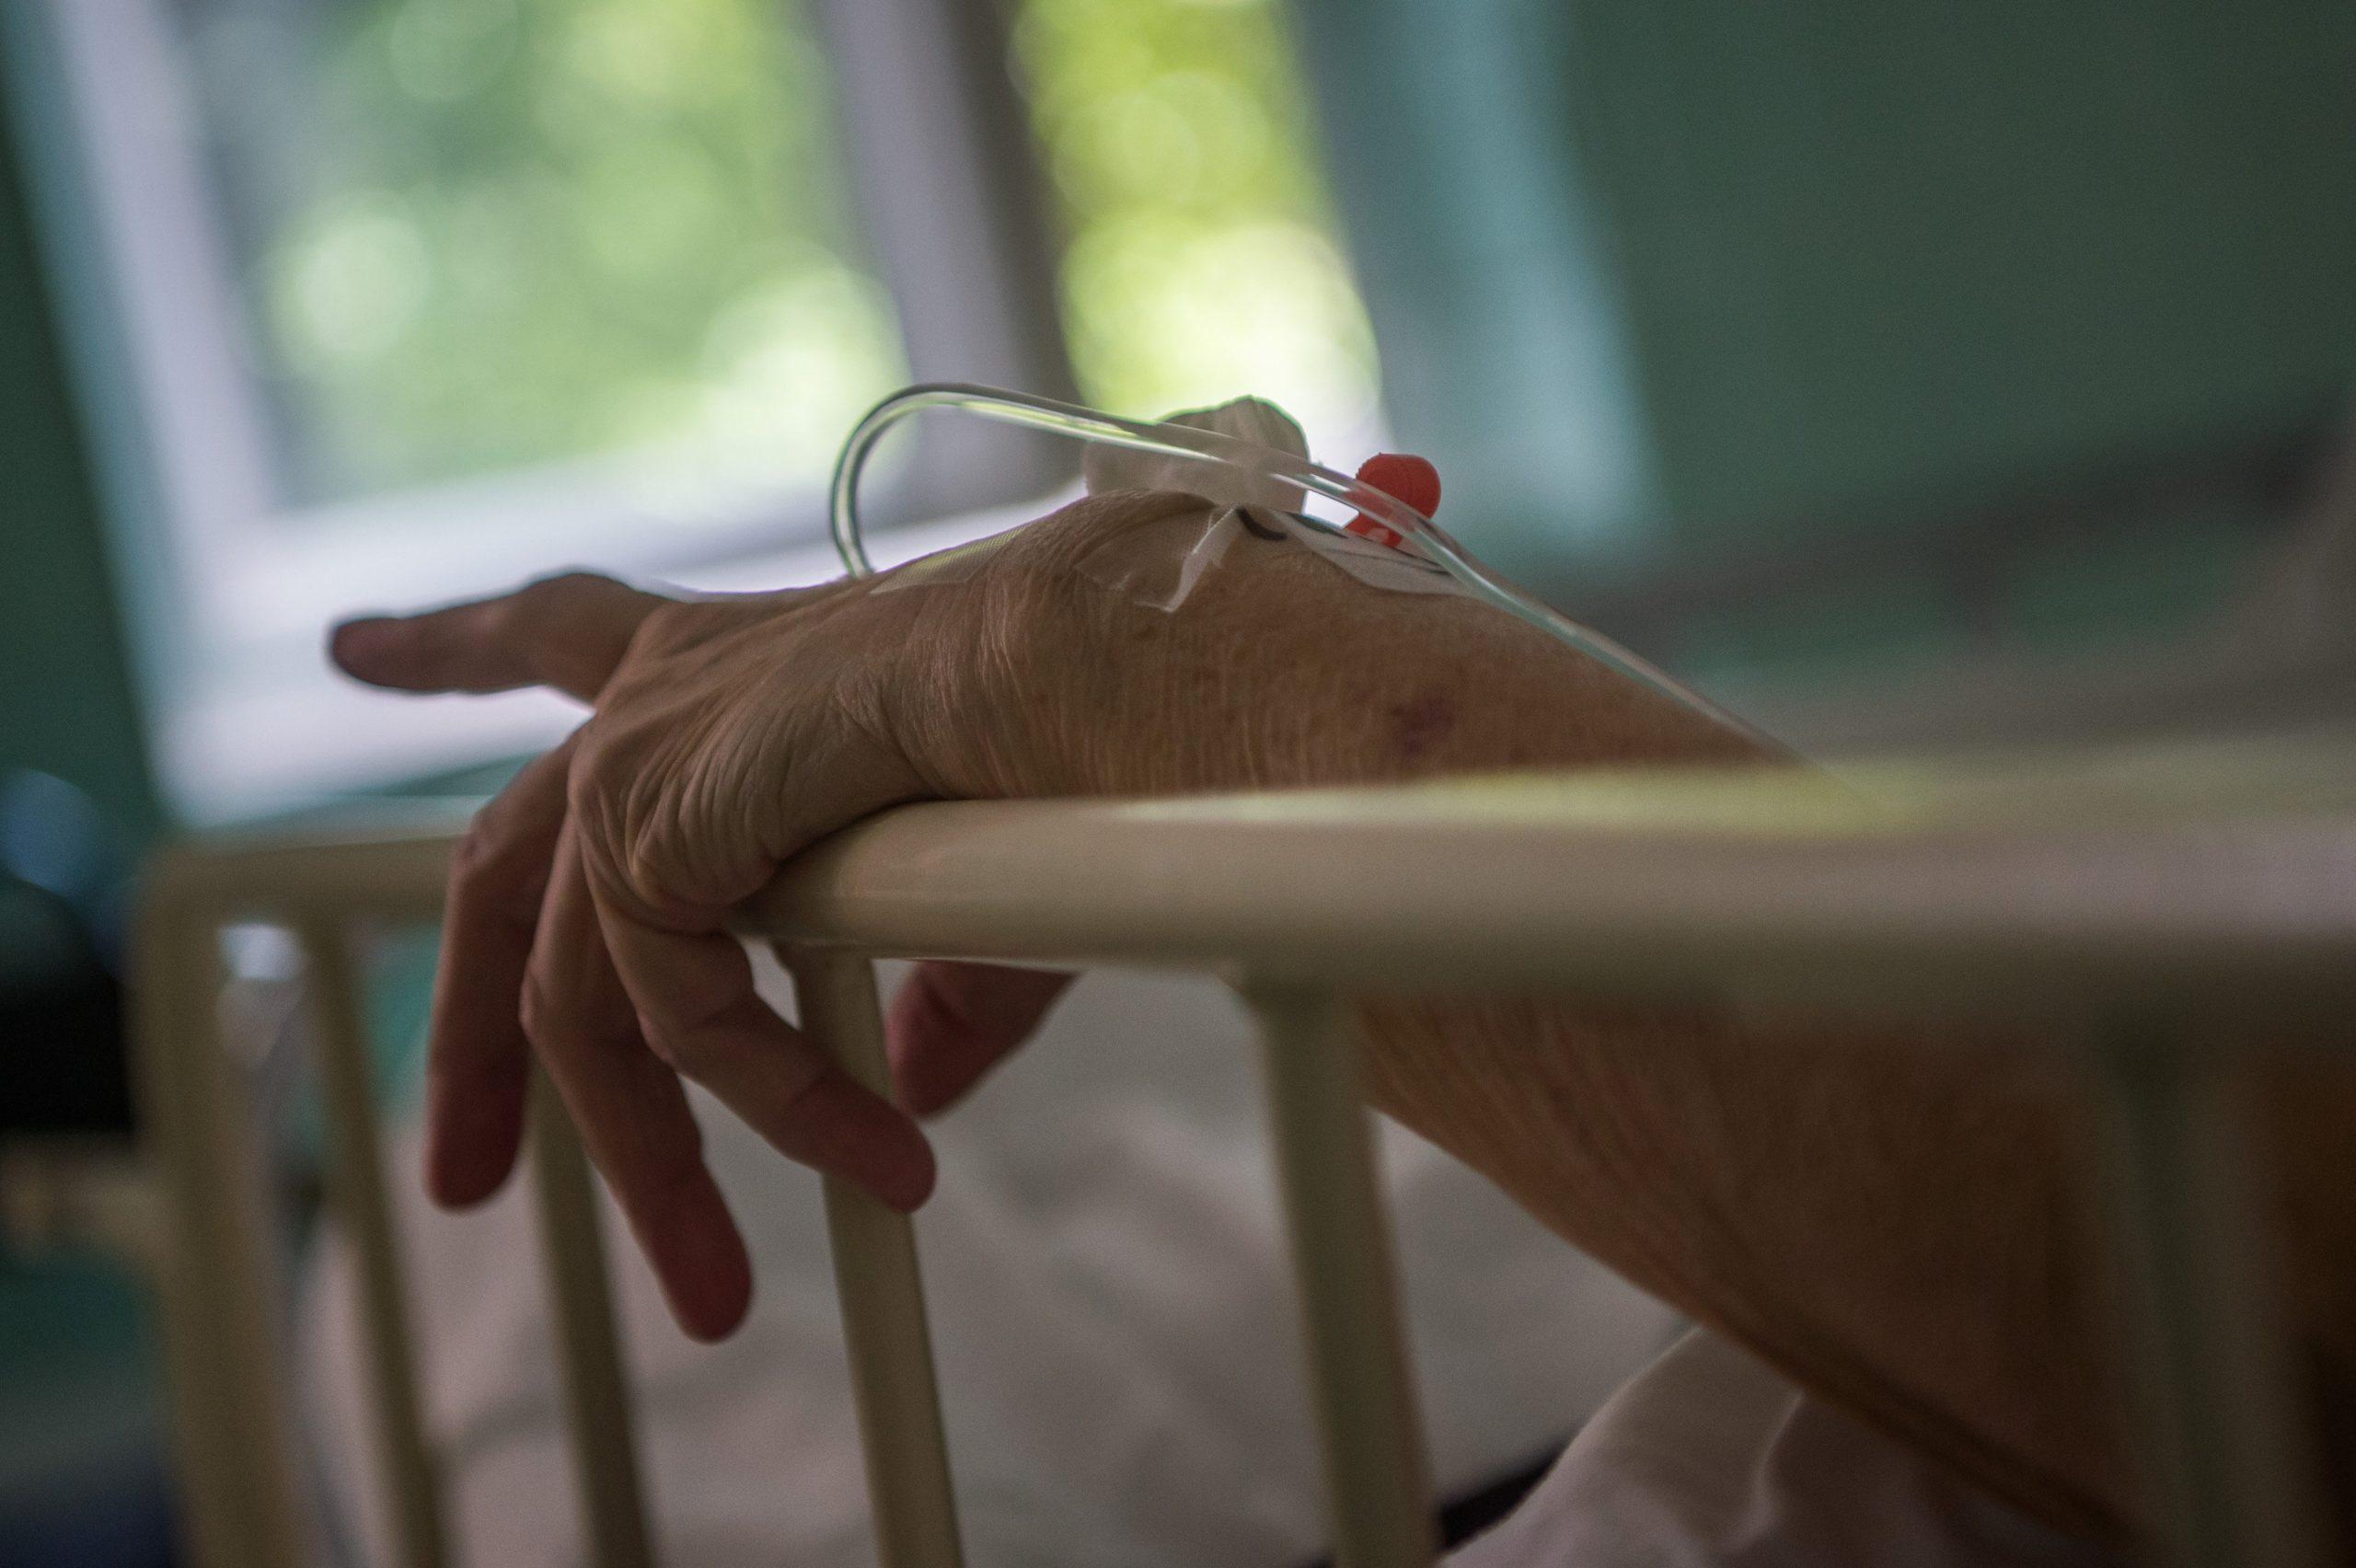 Coronavirus: New Record Daily Number of Fatalities Registered in Hungary